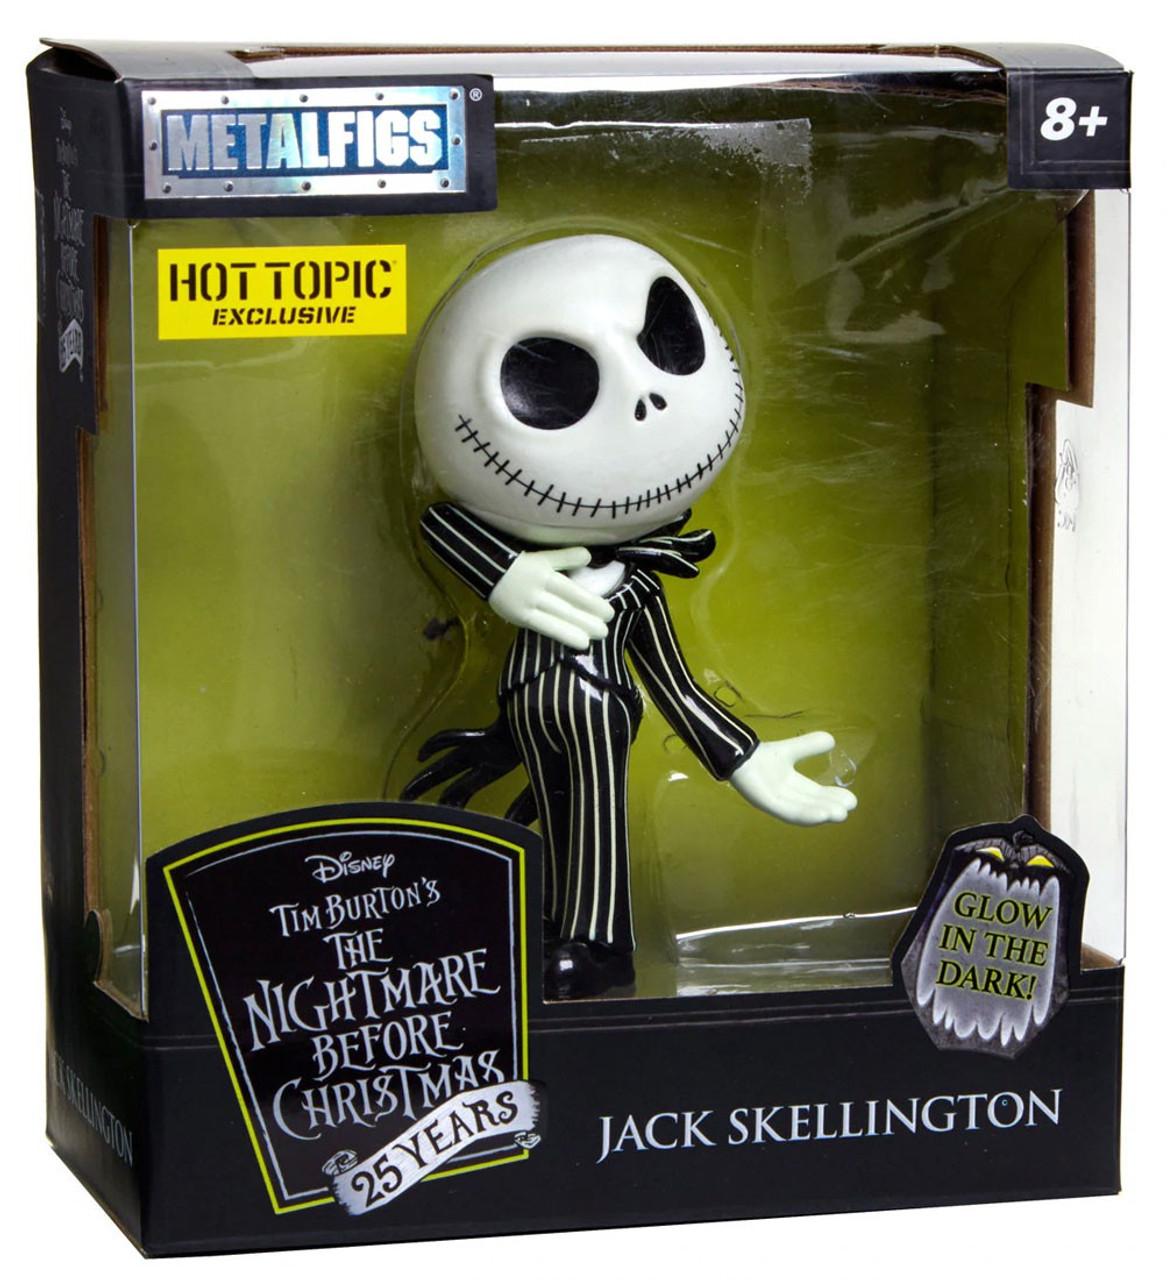 Nightmare Before Christmas Jack Skellington Miniature Figurine Nano Metalfigs